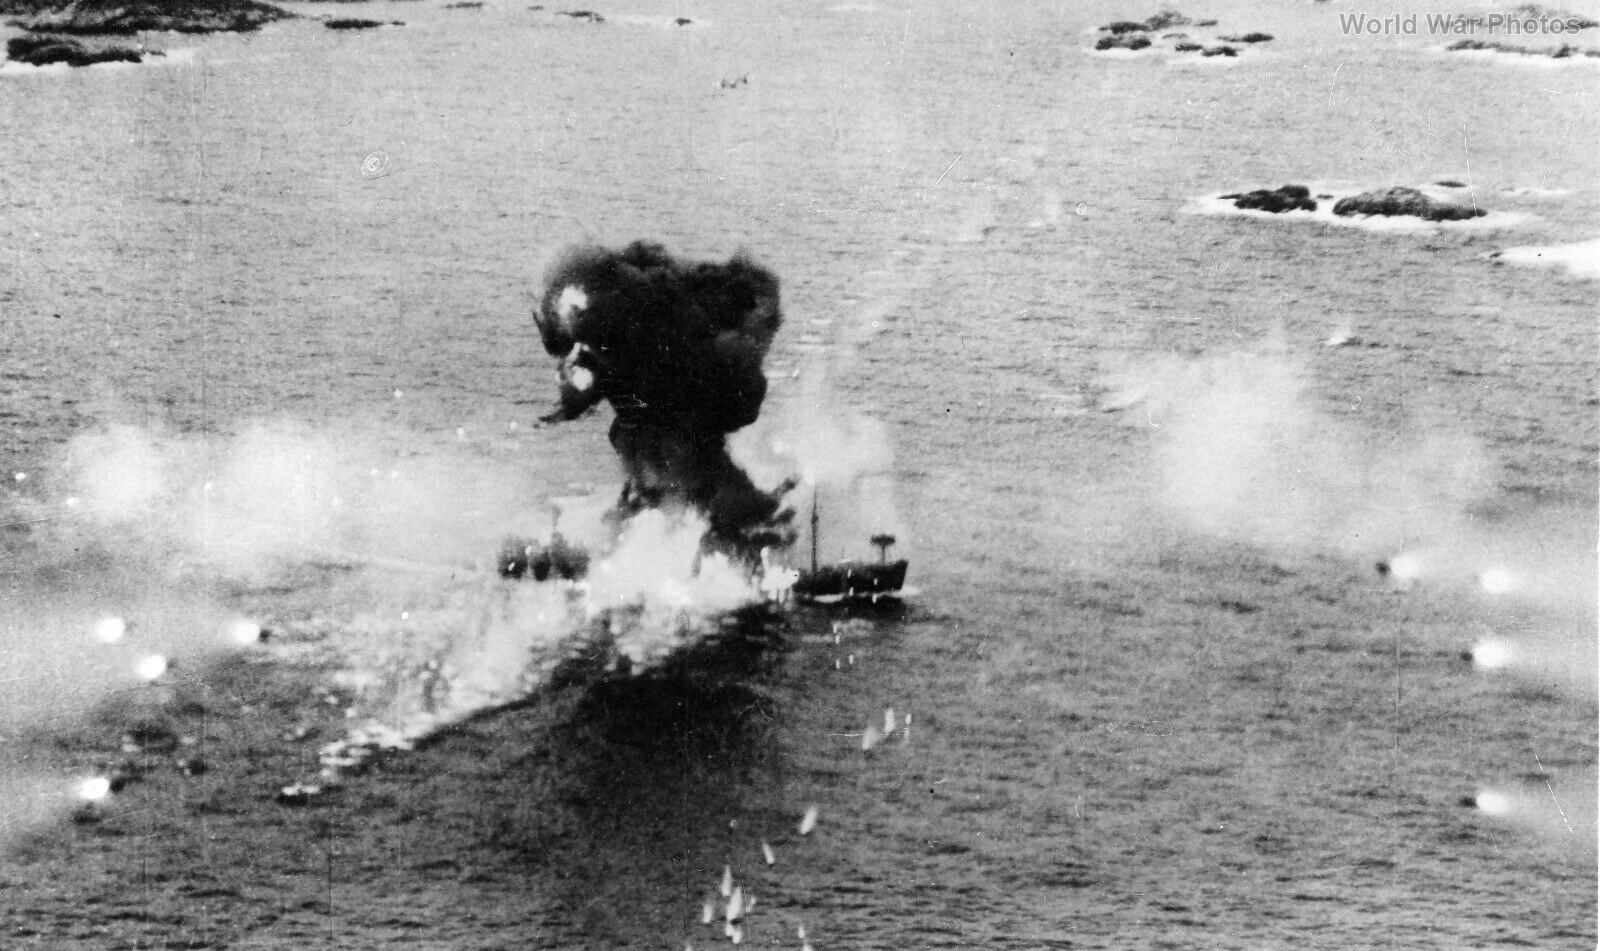 Beaufighter attack